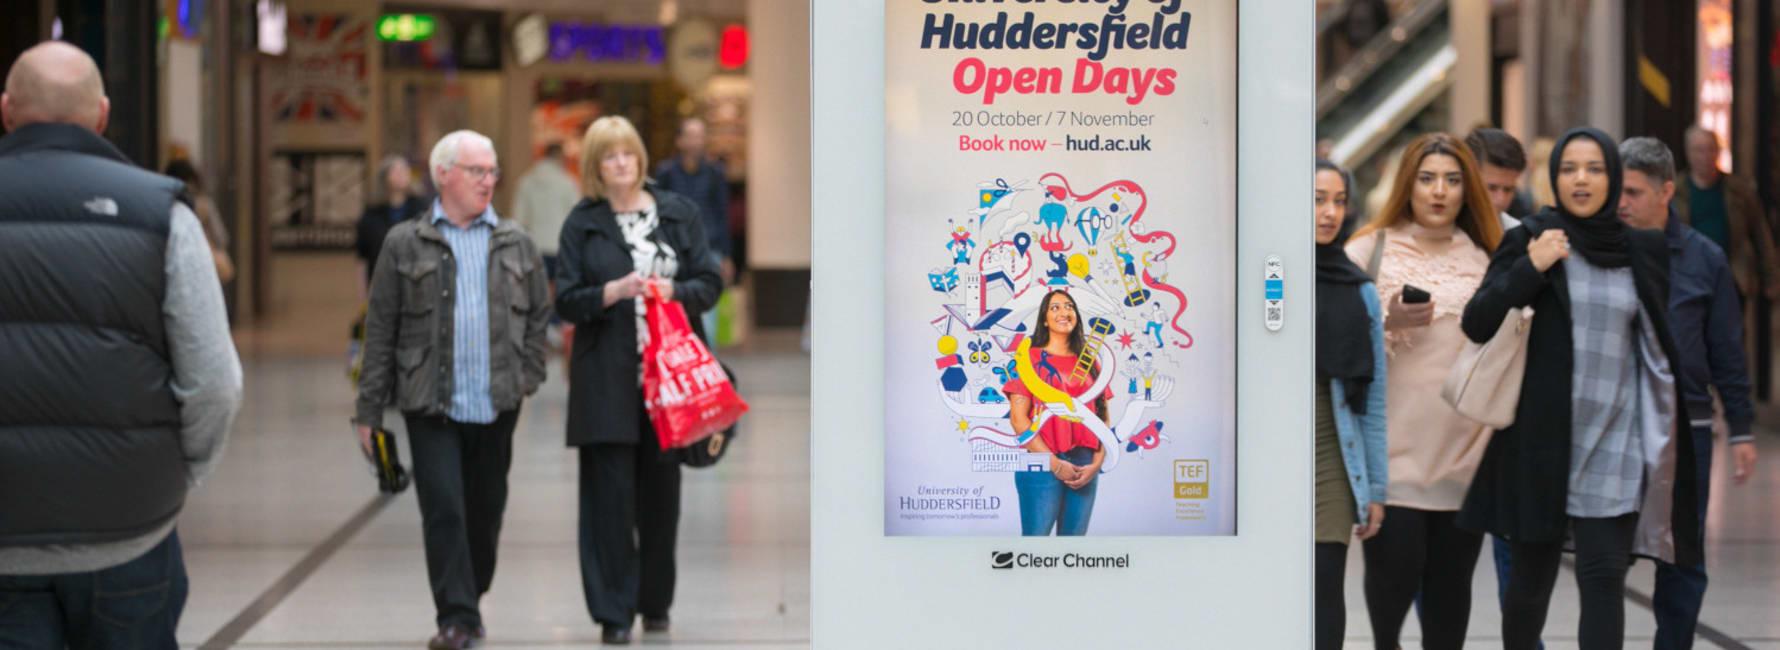 Malls Live Screen in Huddersfield